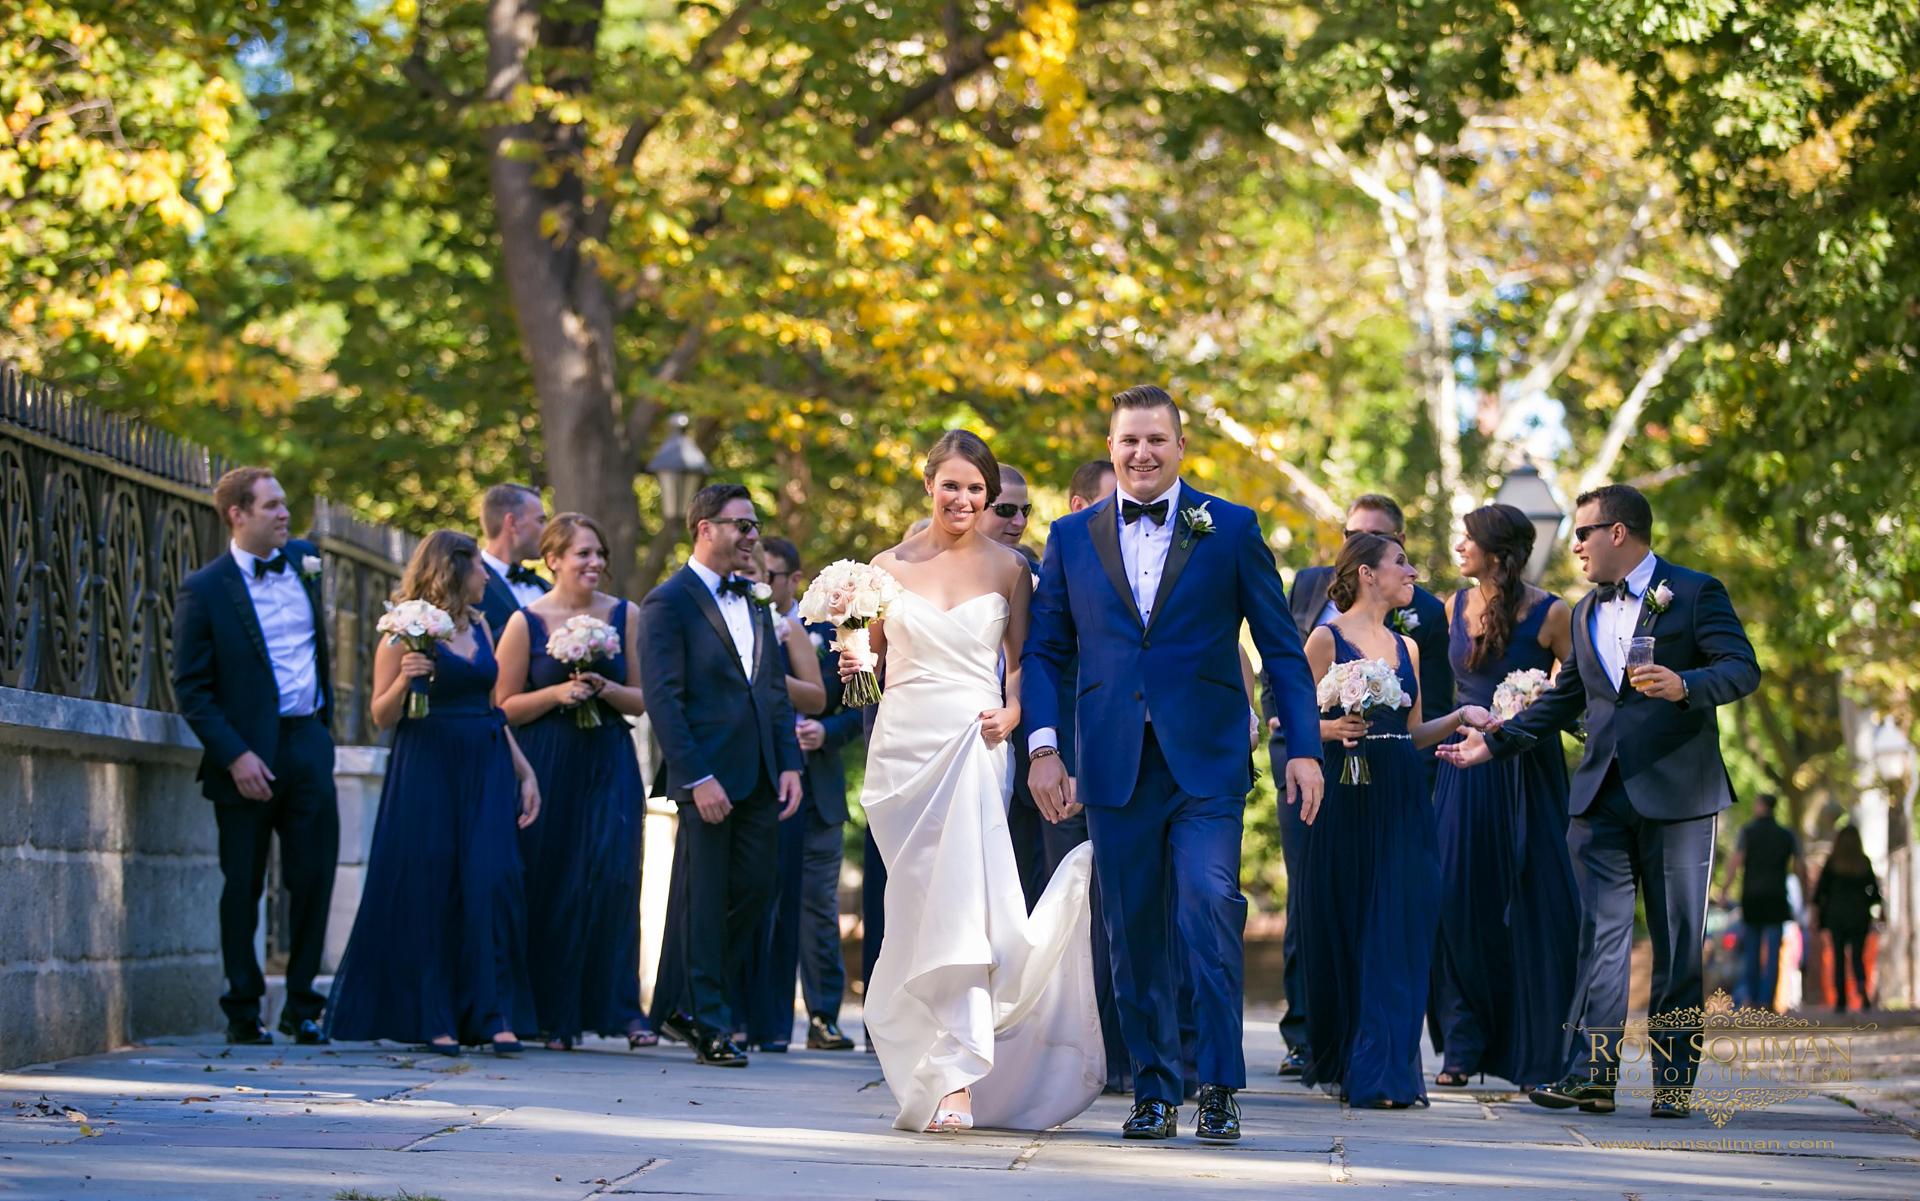 Race Street Pier Park Best Wedding photos